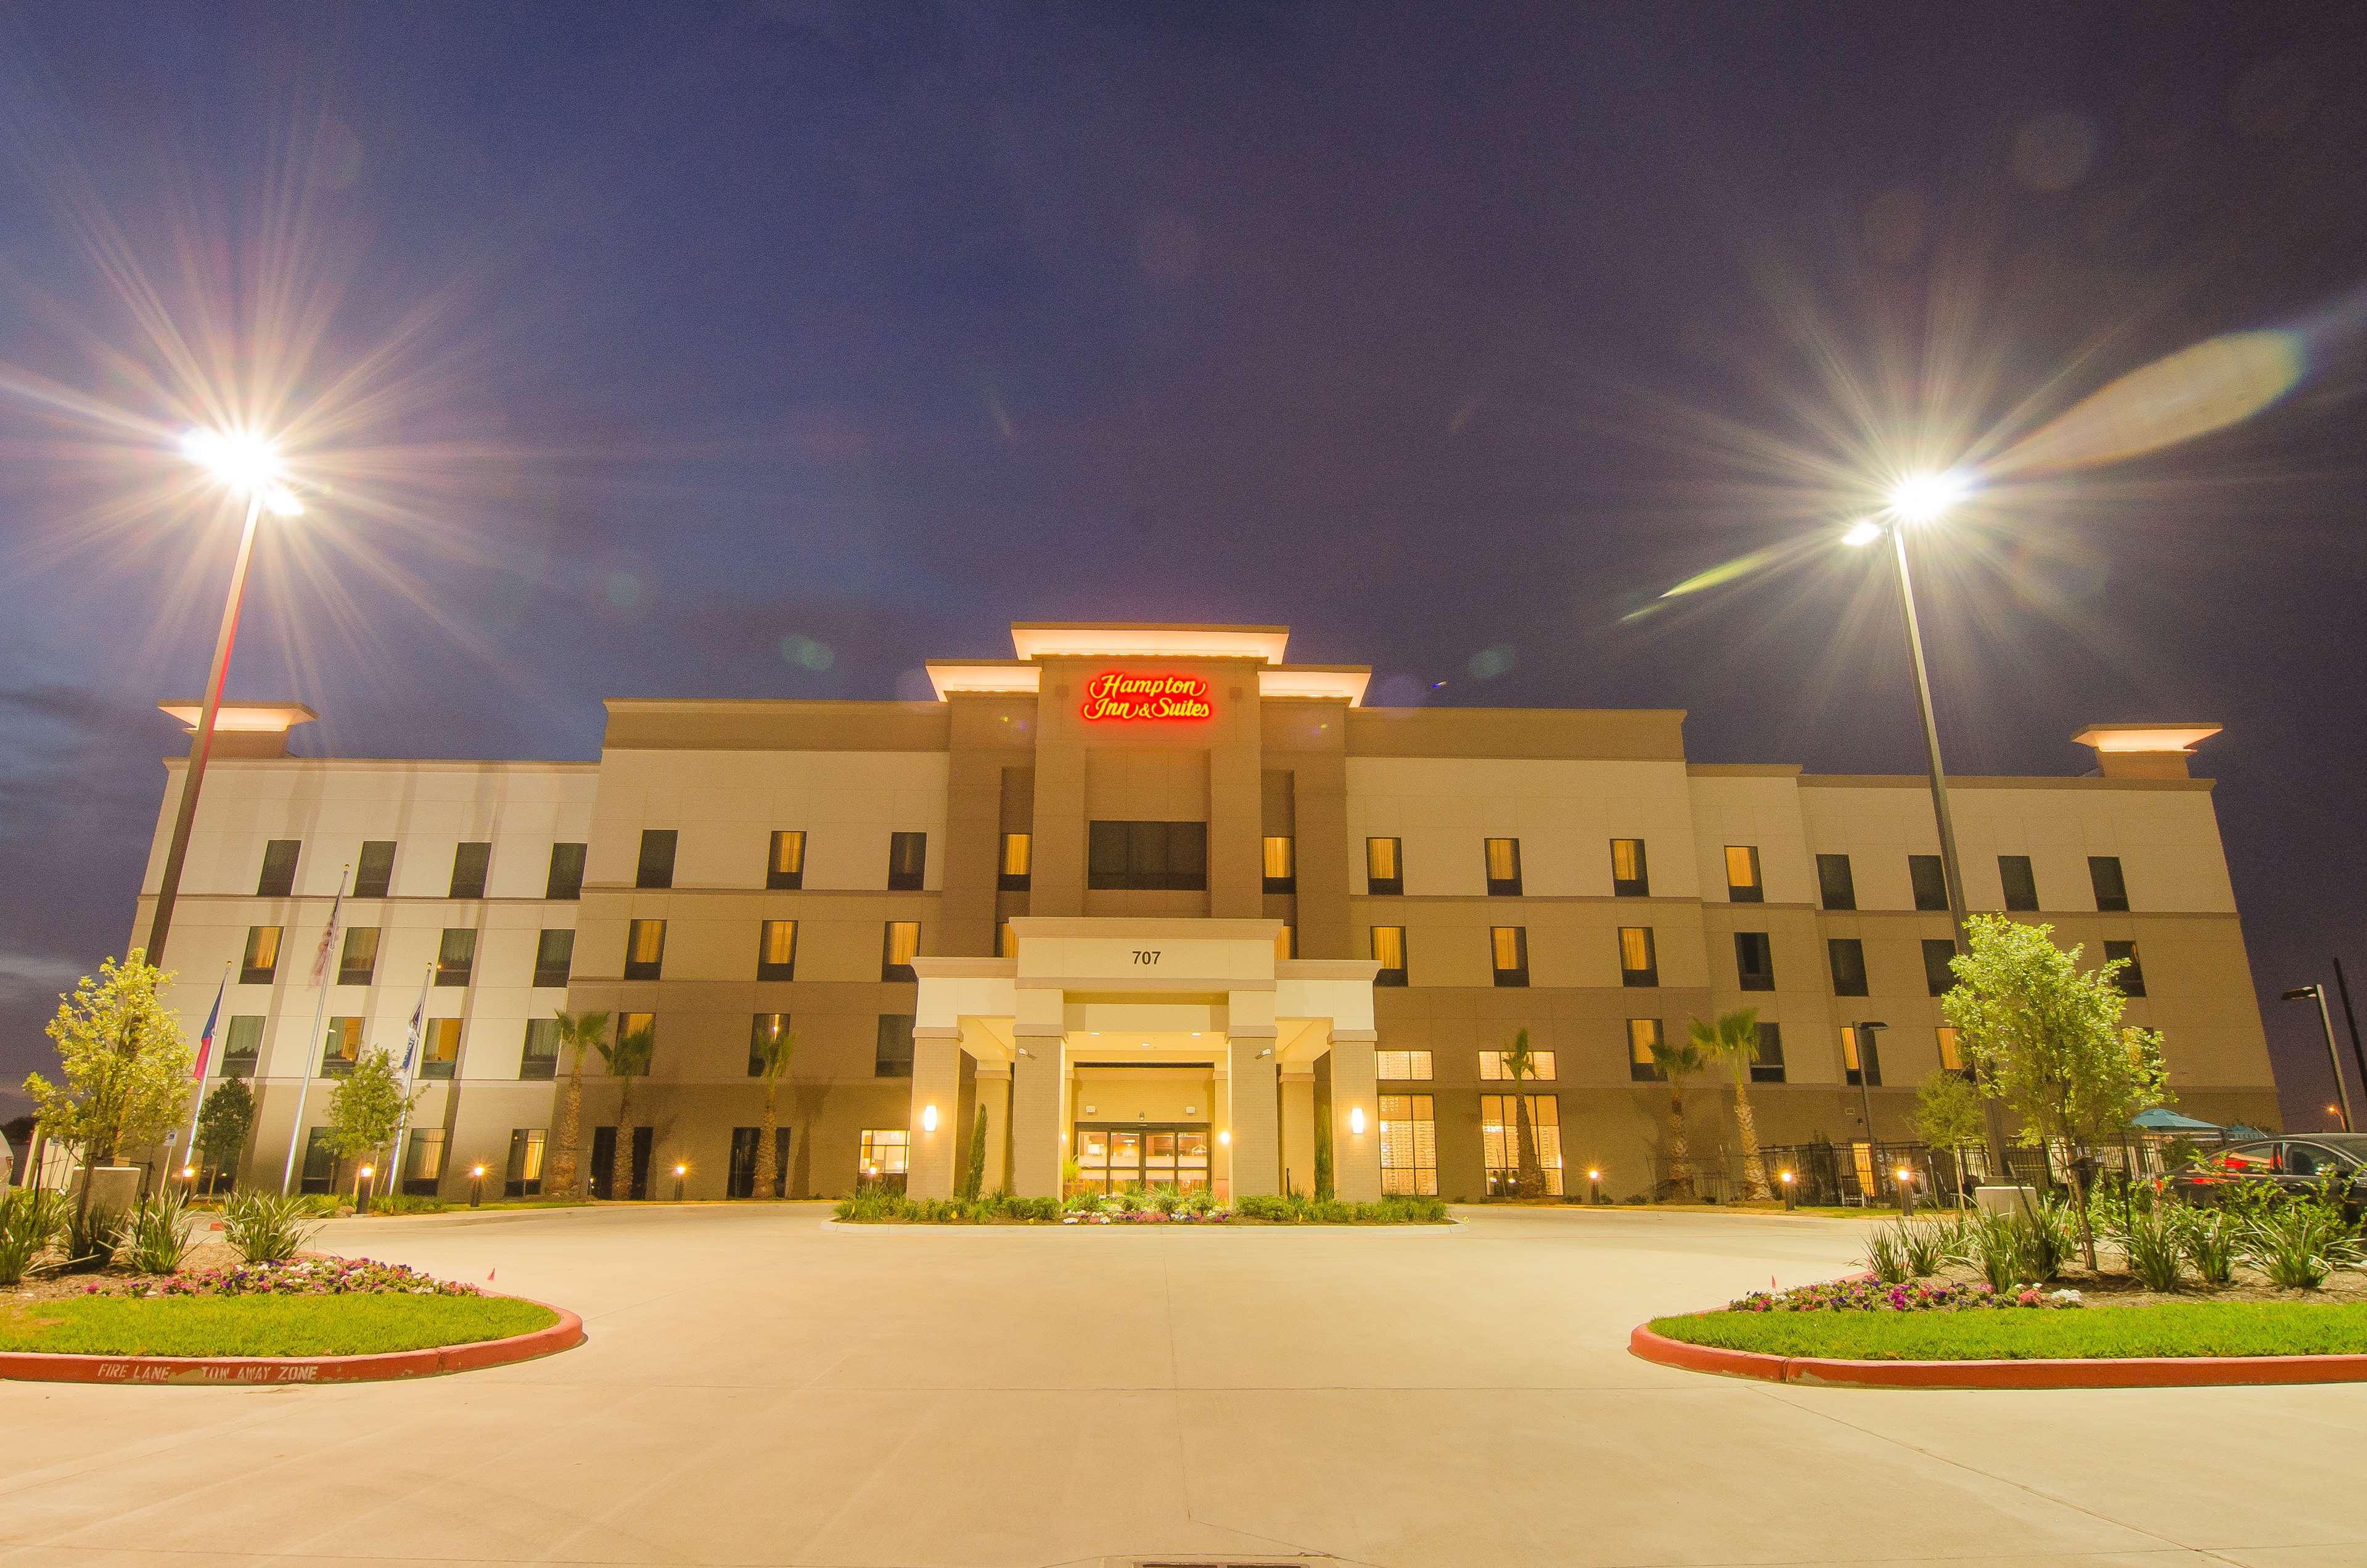 Hampton Inn & Suites Houston North IAH image 0